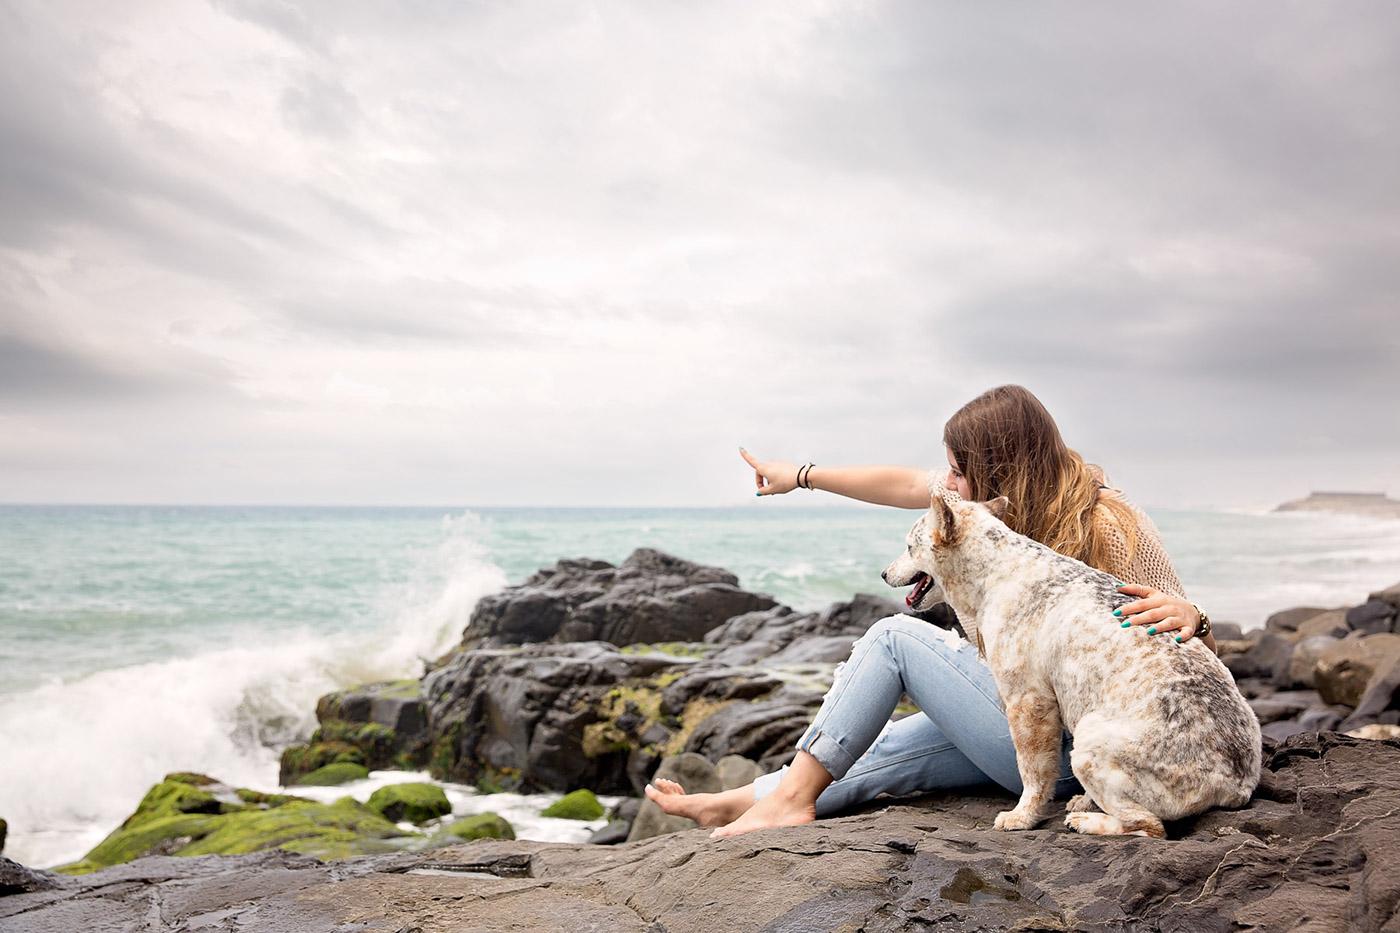 Австралийская овчарка: Roxy's Remedies / фото Alicia Rius